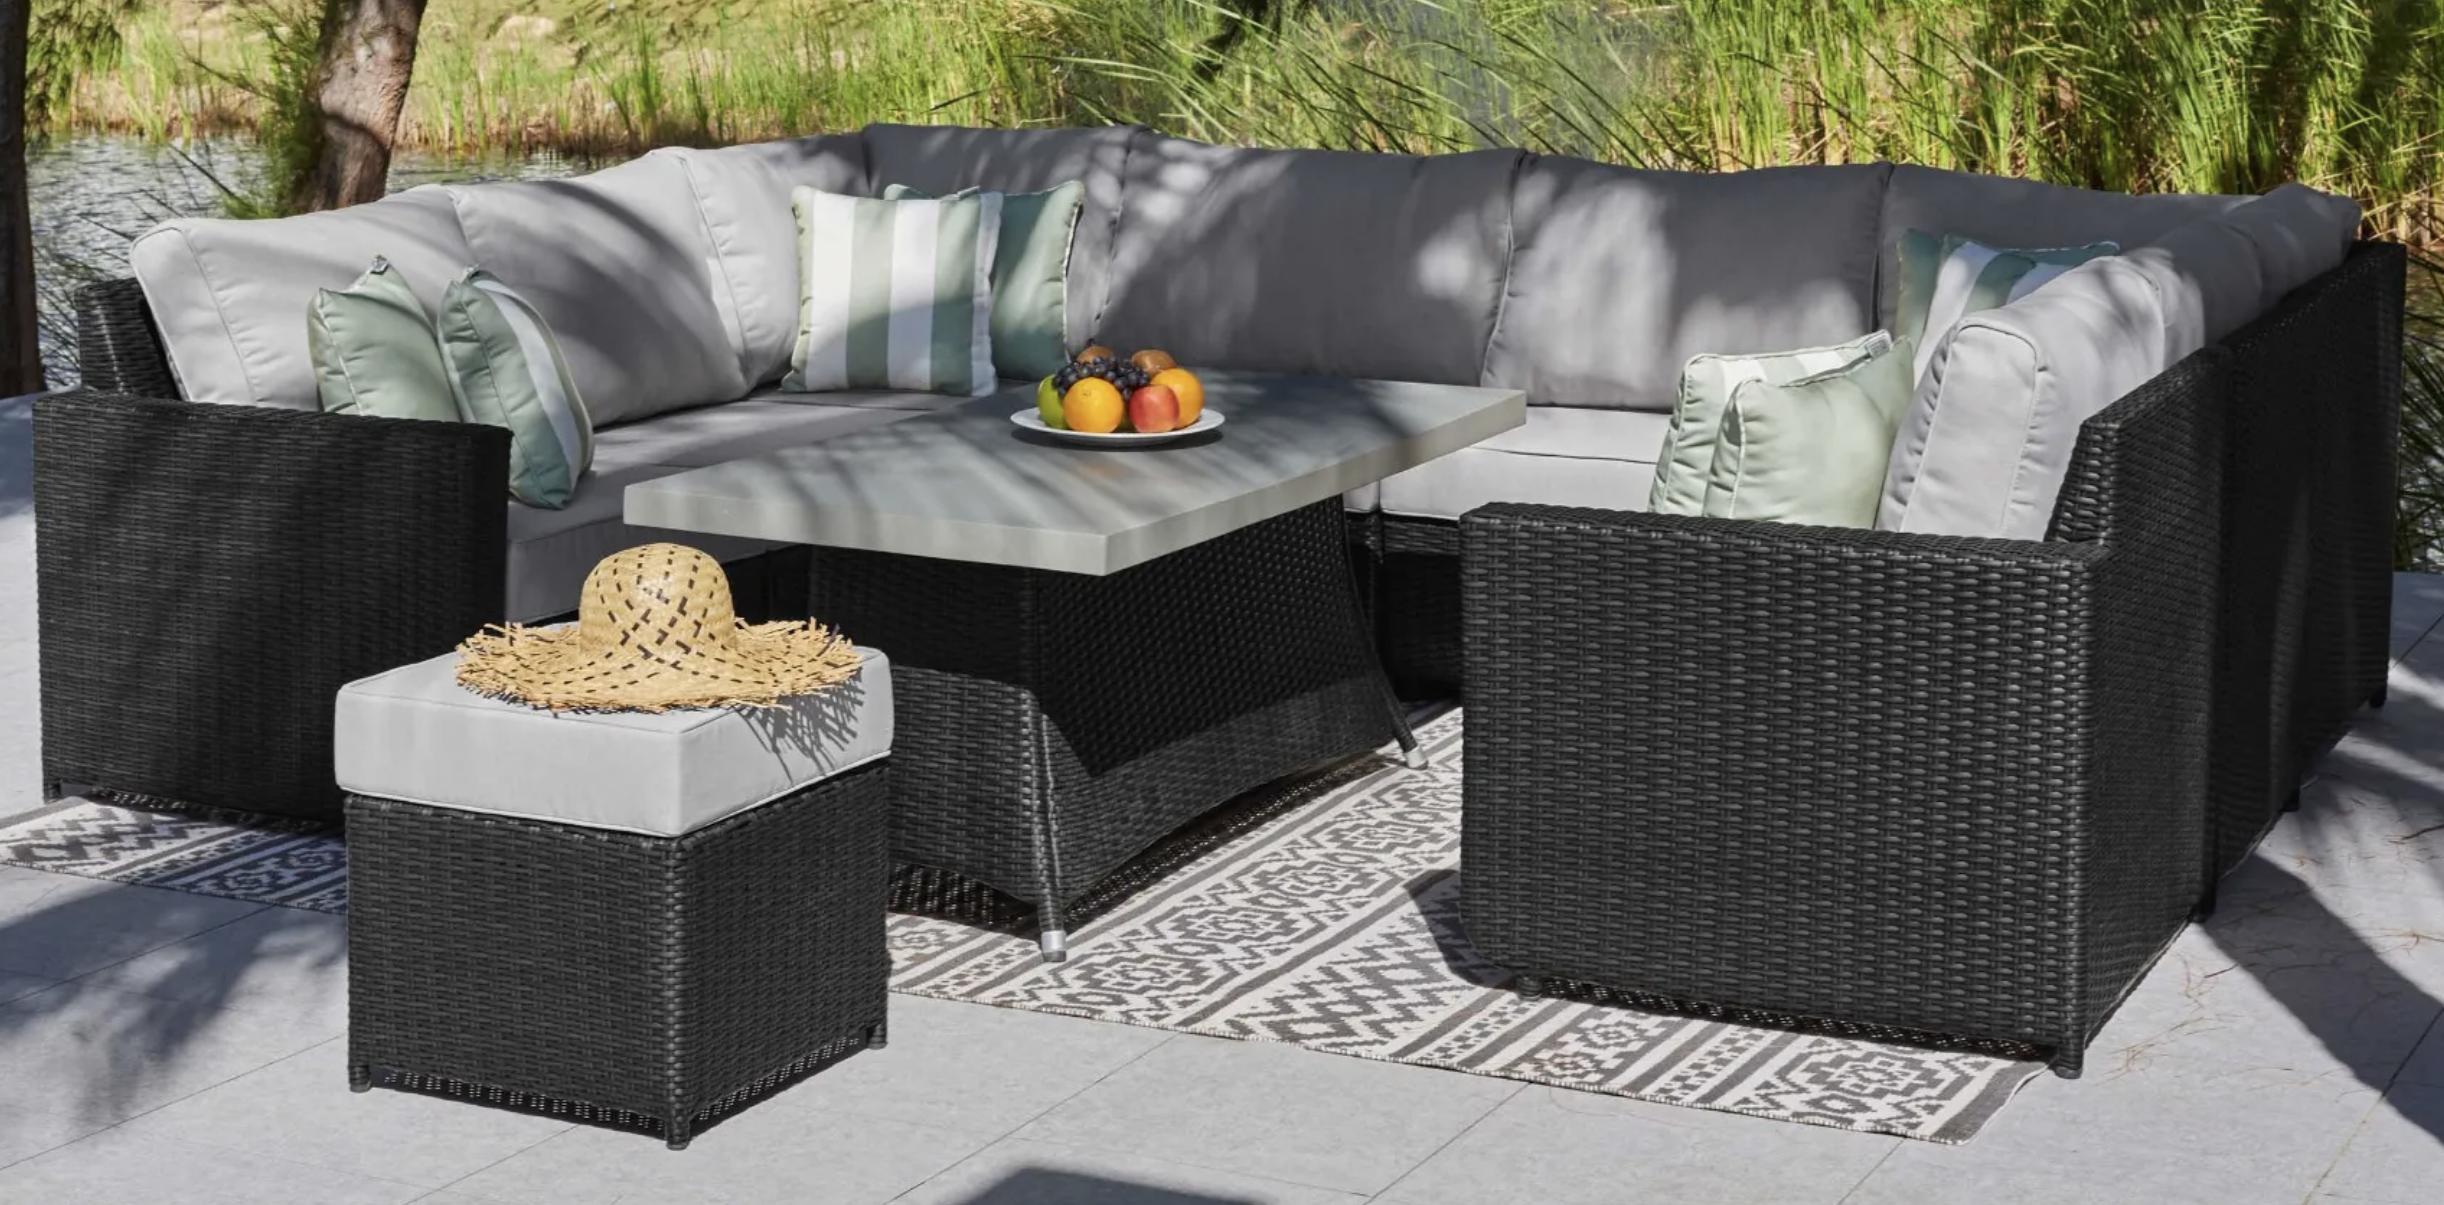 Halo U-Shaped Outdoor Sofa